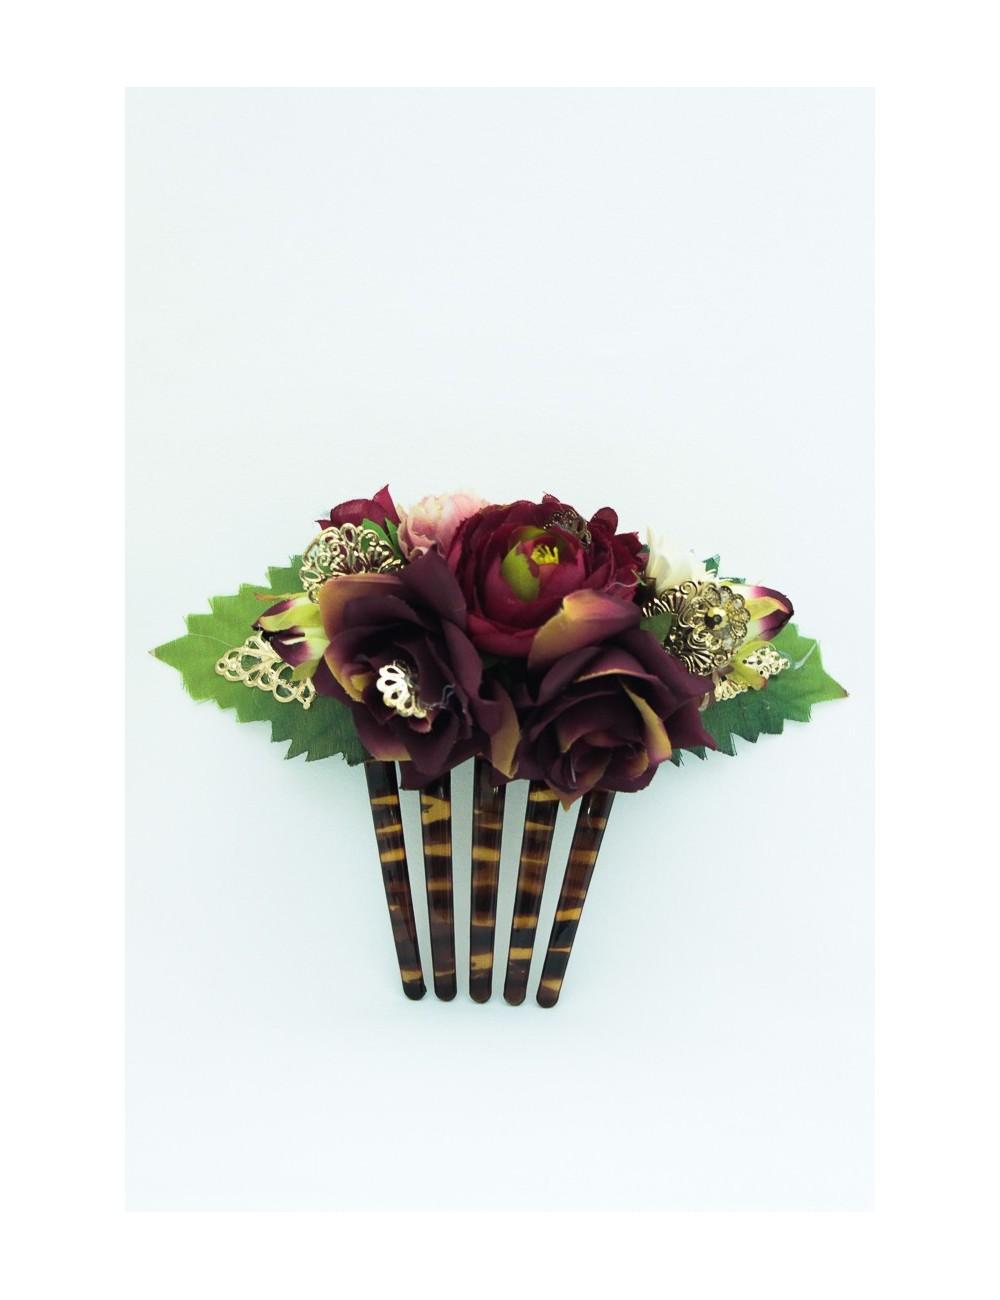 Superbe Peigne fleuris Parme